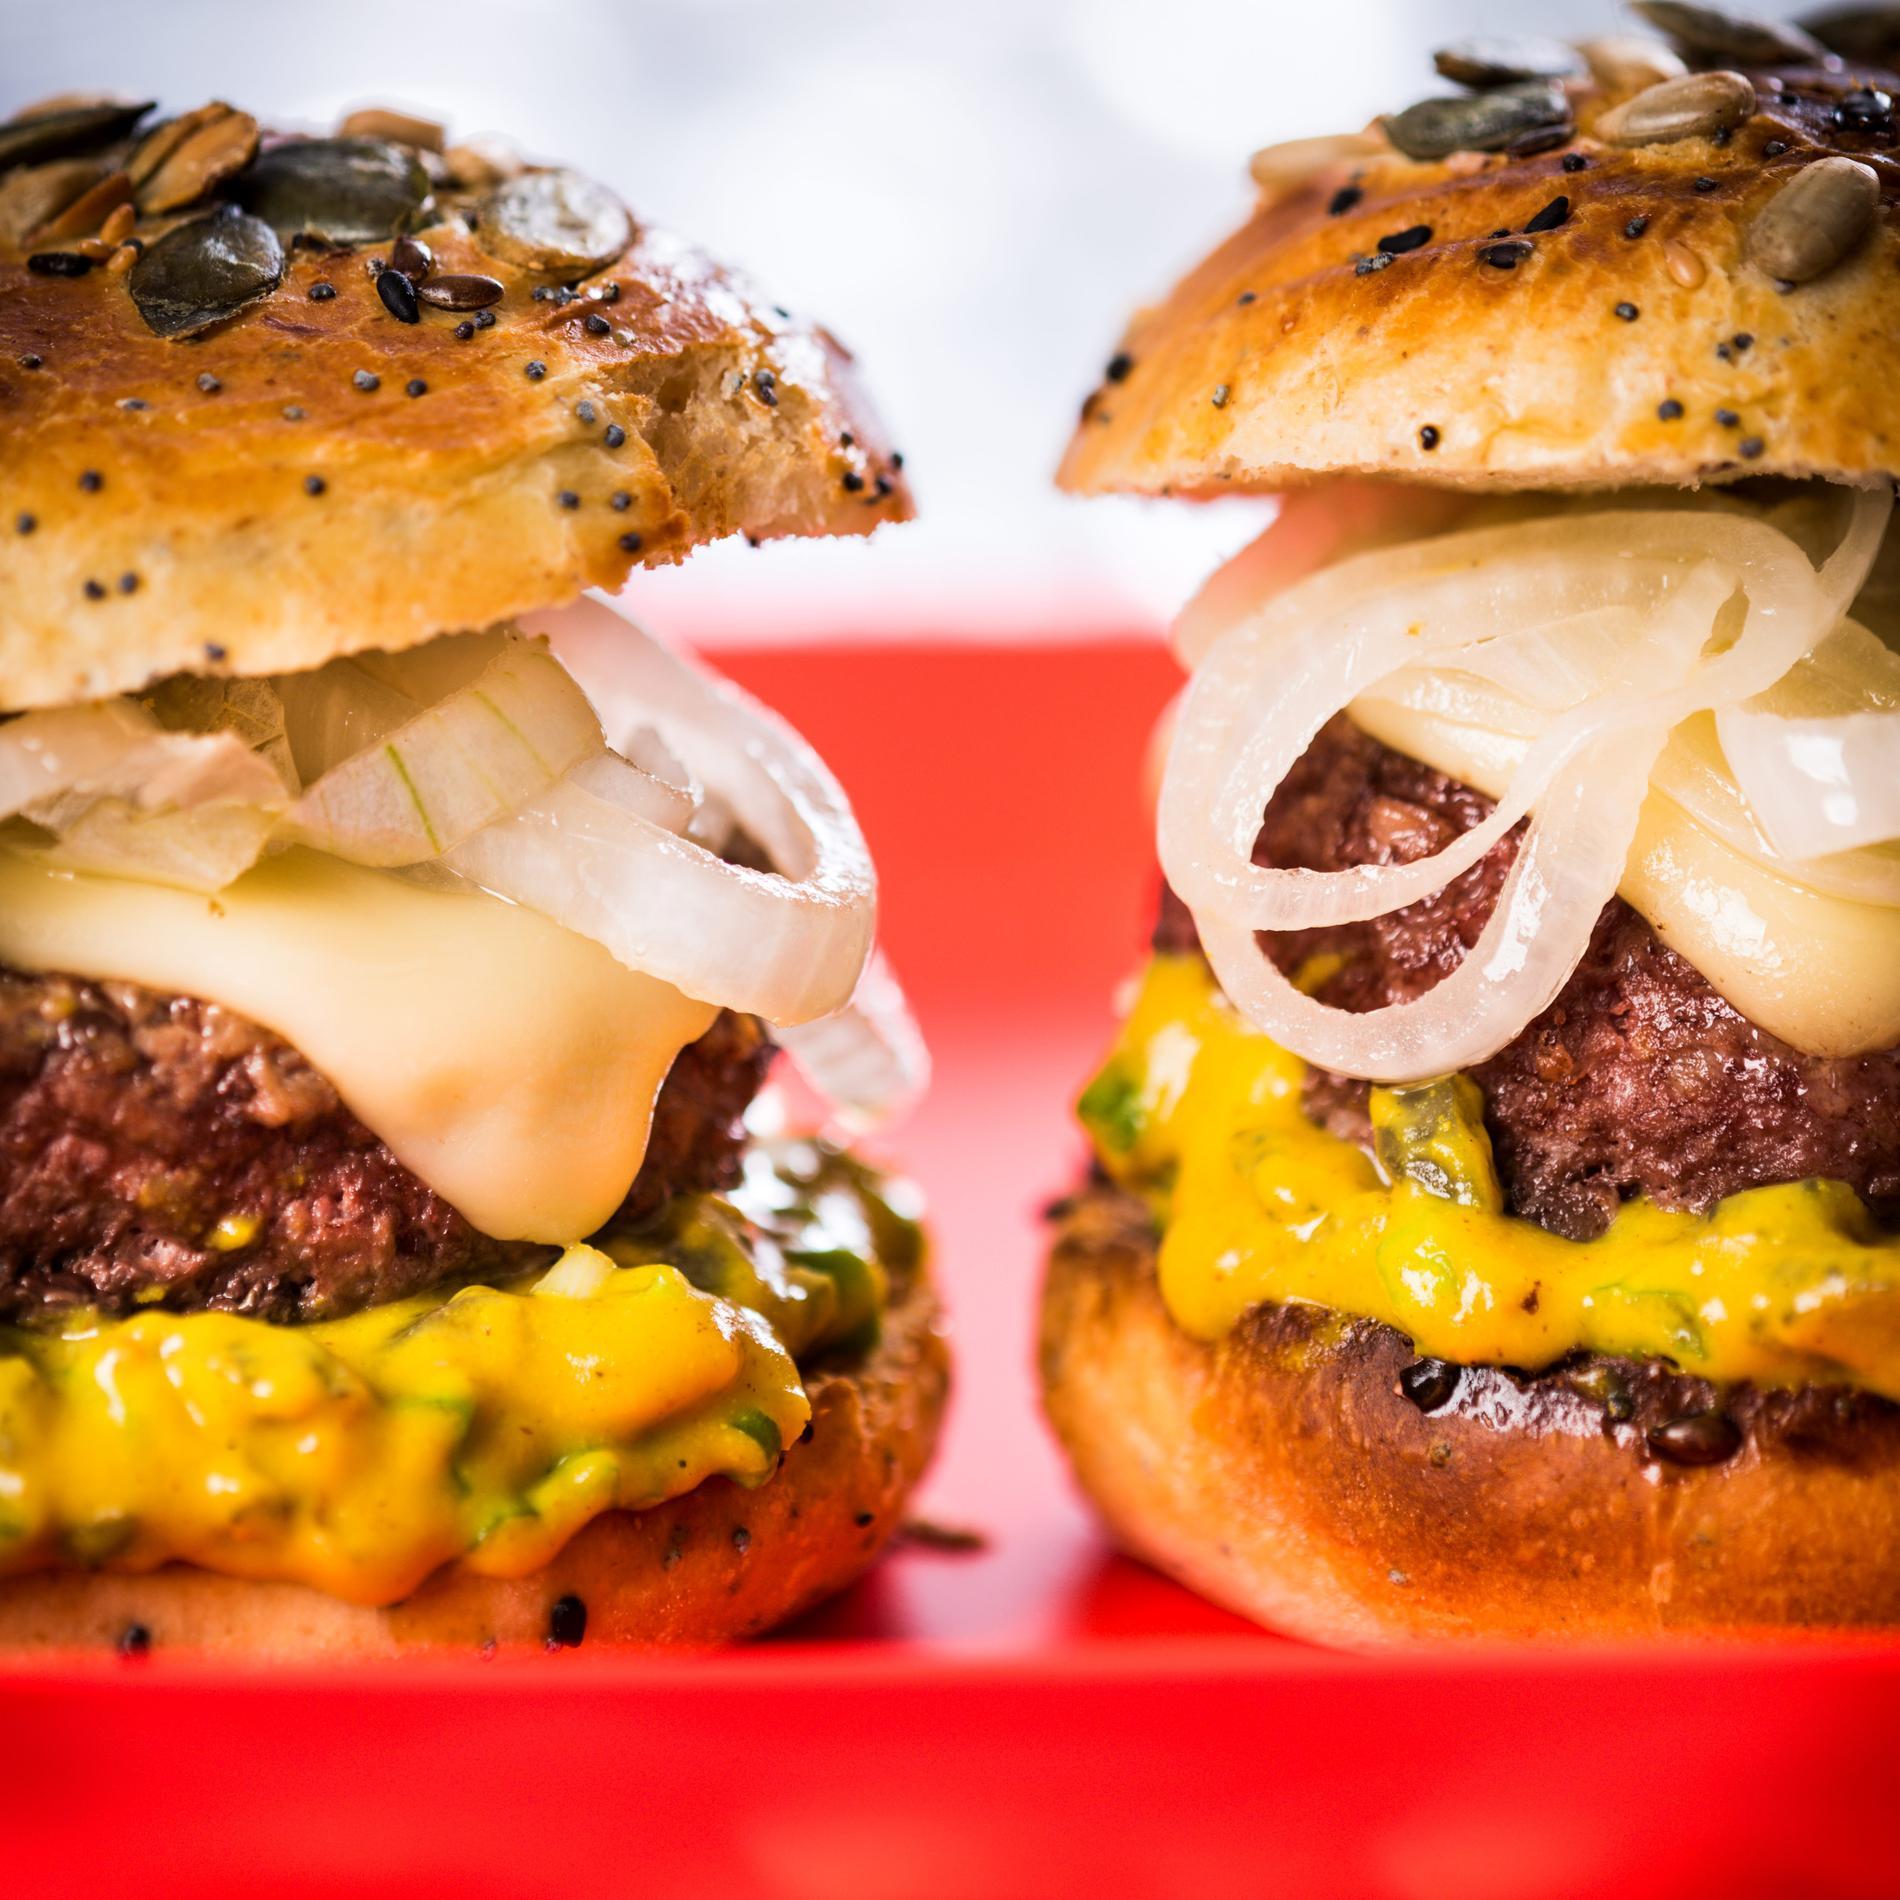 recette le burger de brice morvent cuisine madame figaro. Black Bedroom Furniture Sets. Home Design Ideas